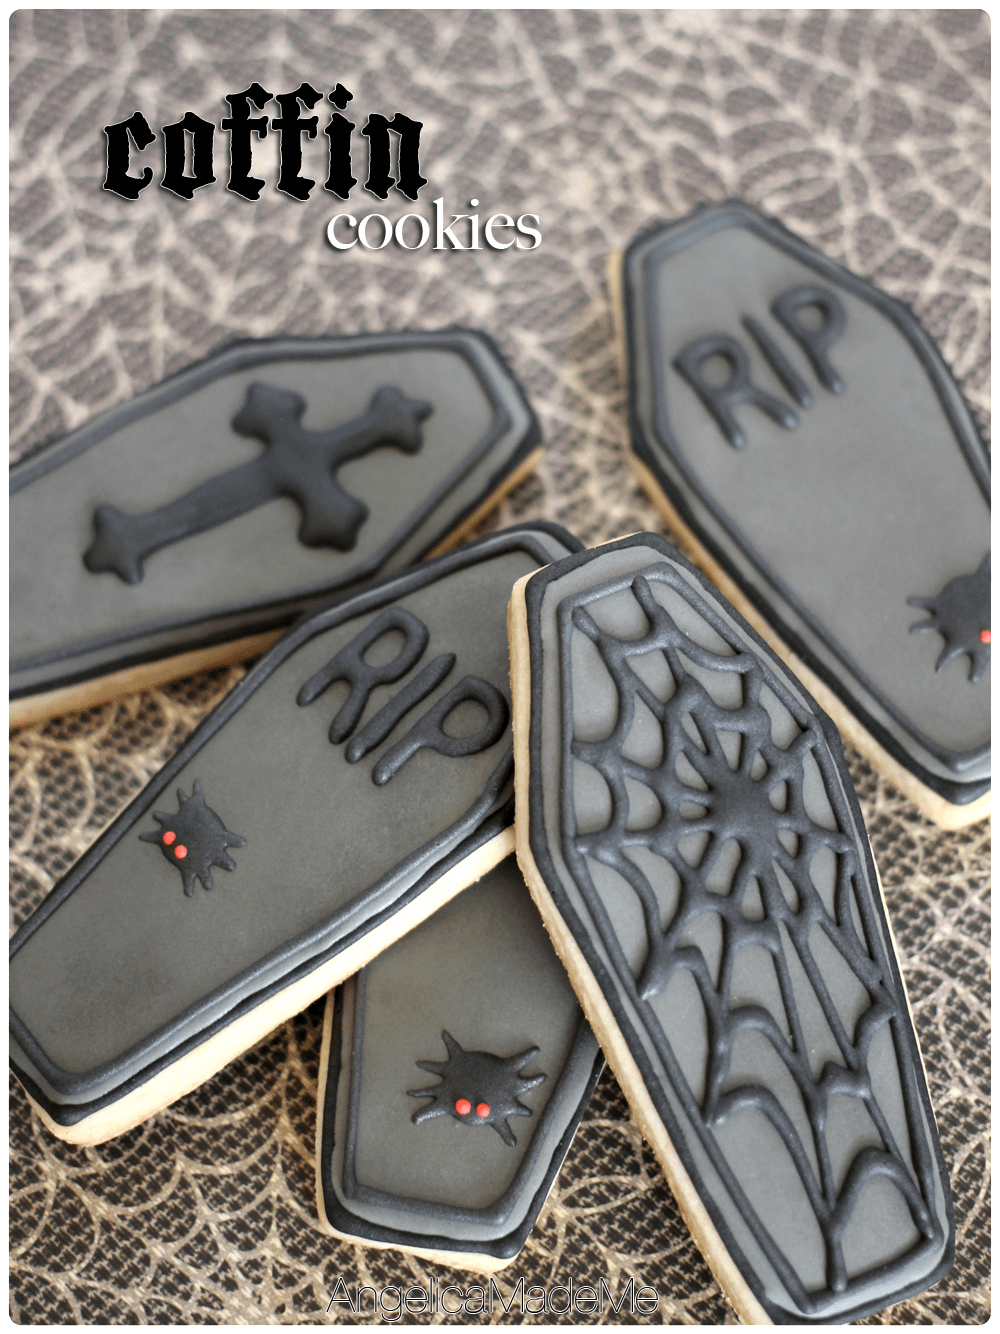 Custom Decorated Cookies for Halloween - AngelicaMadeMe #halloweencookiesdecorated